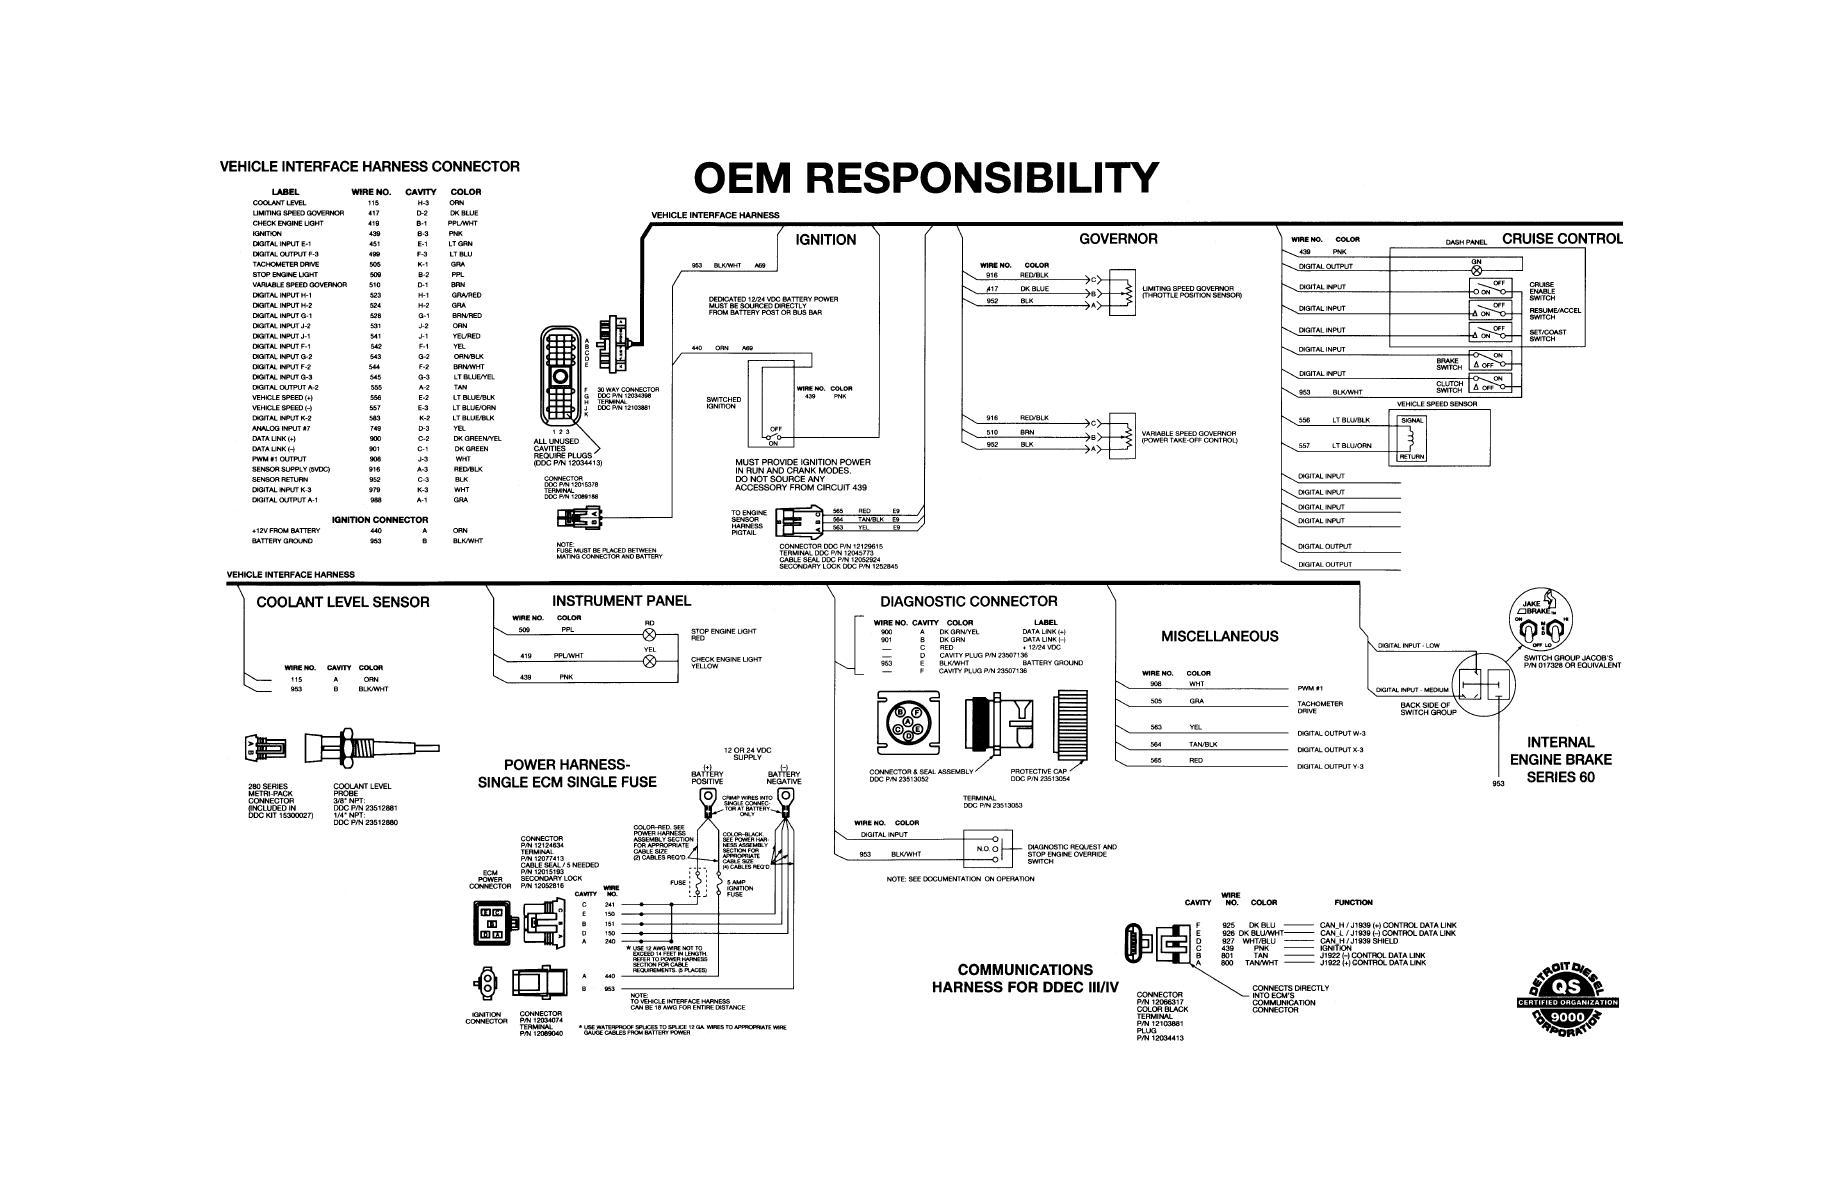 [DIAGRAM_4PO]  TC_5585] Wiring Diagram In Addition Detroit Diesel Series 60 Ecm Wiring  Diagram   Sel Detroit 60 Ecm Wiring Diagram      Ogeno Dome Mohammedshrine Librar Wiring 101